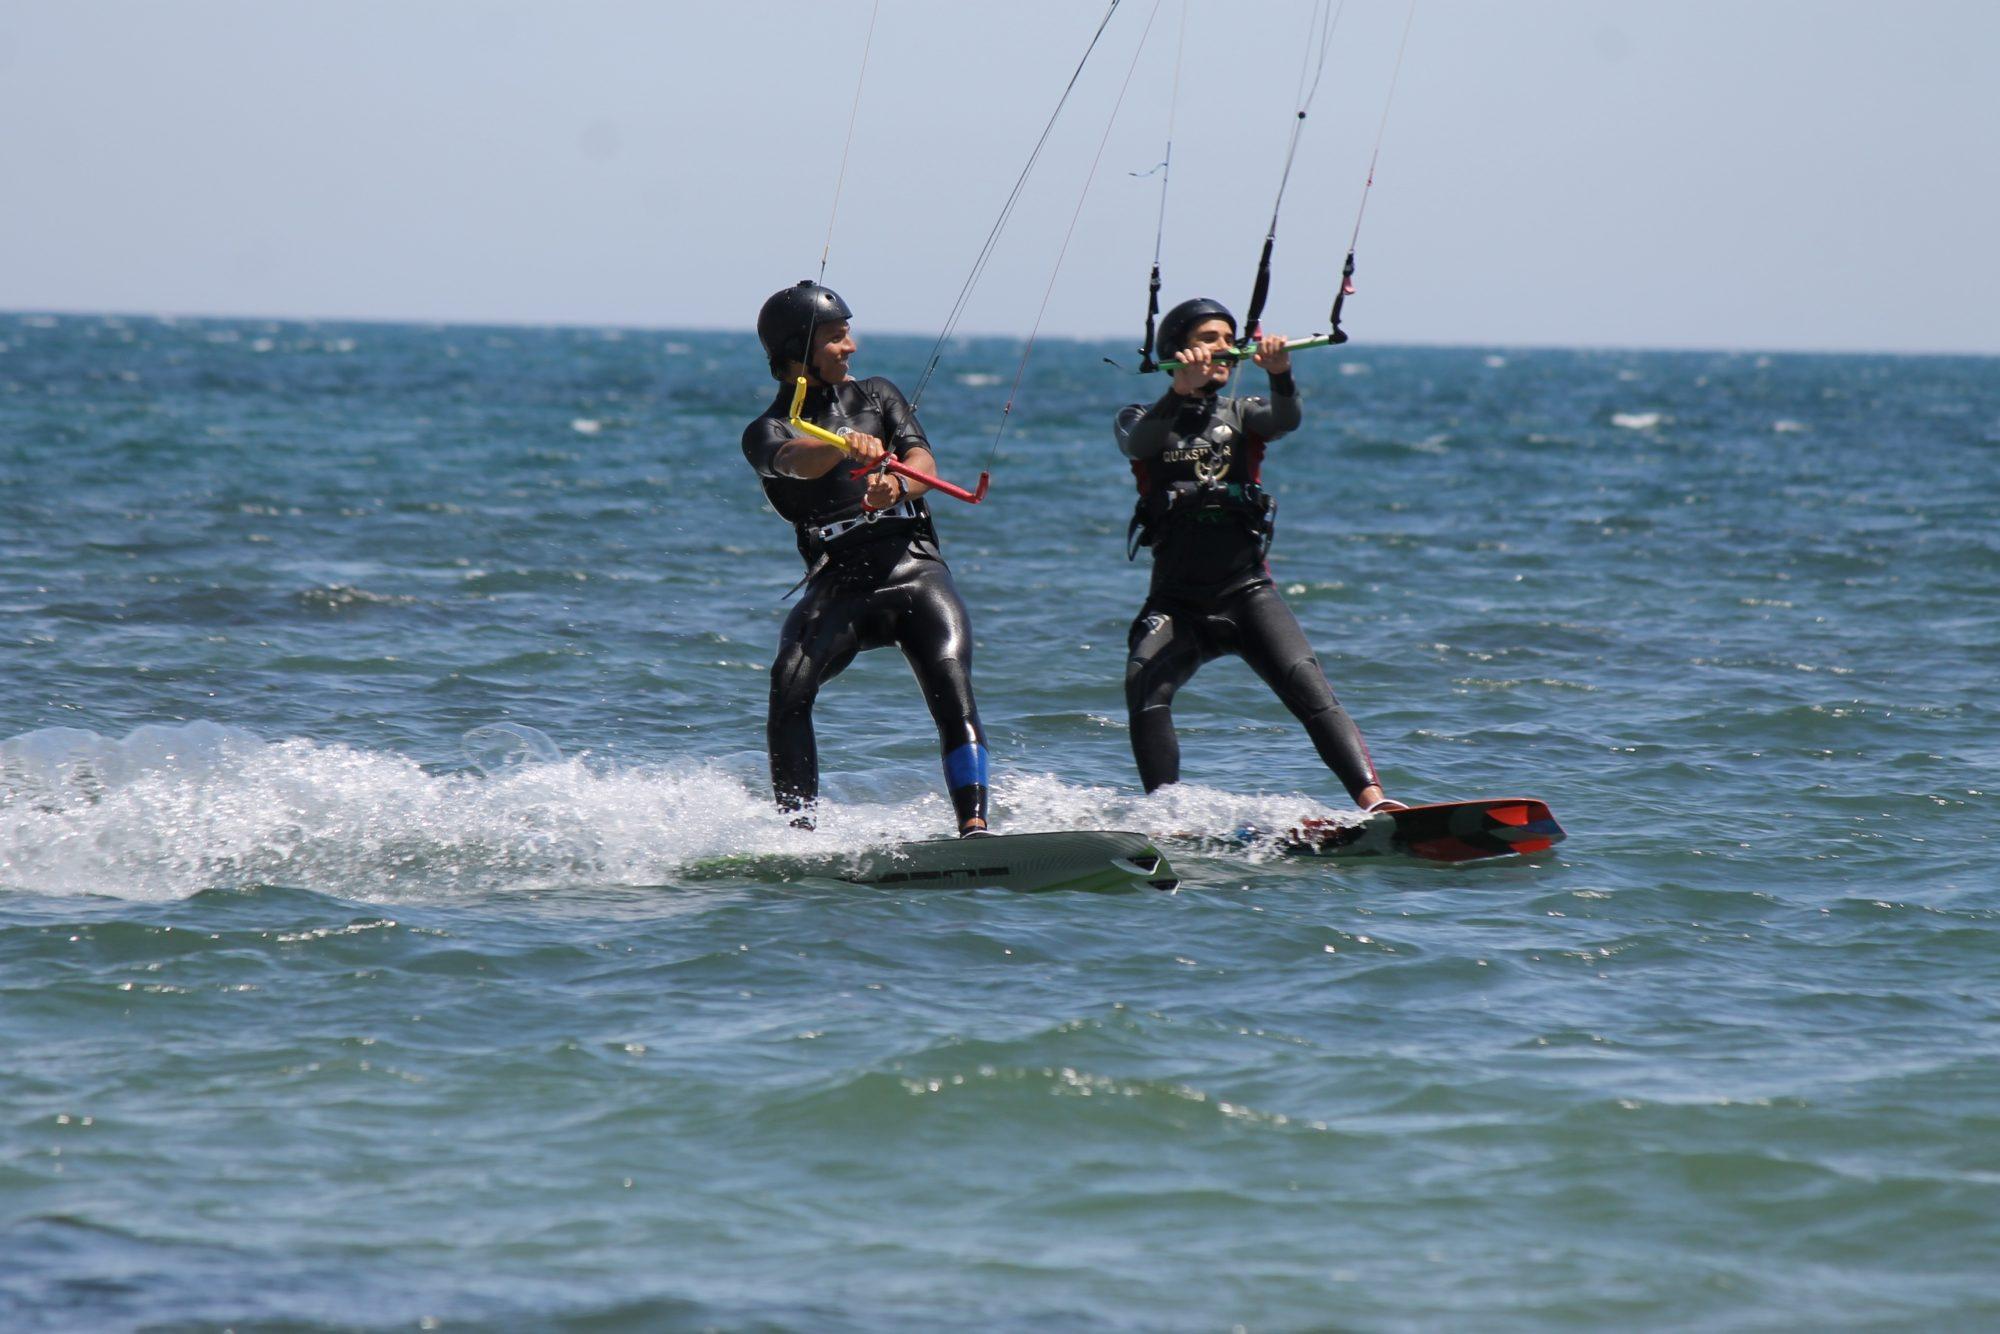 Kitesurf in Sardegna con KiteGeneration, scuola Kite che offre corsi di Kitesurf nel Sud della Sardegna